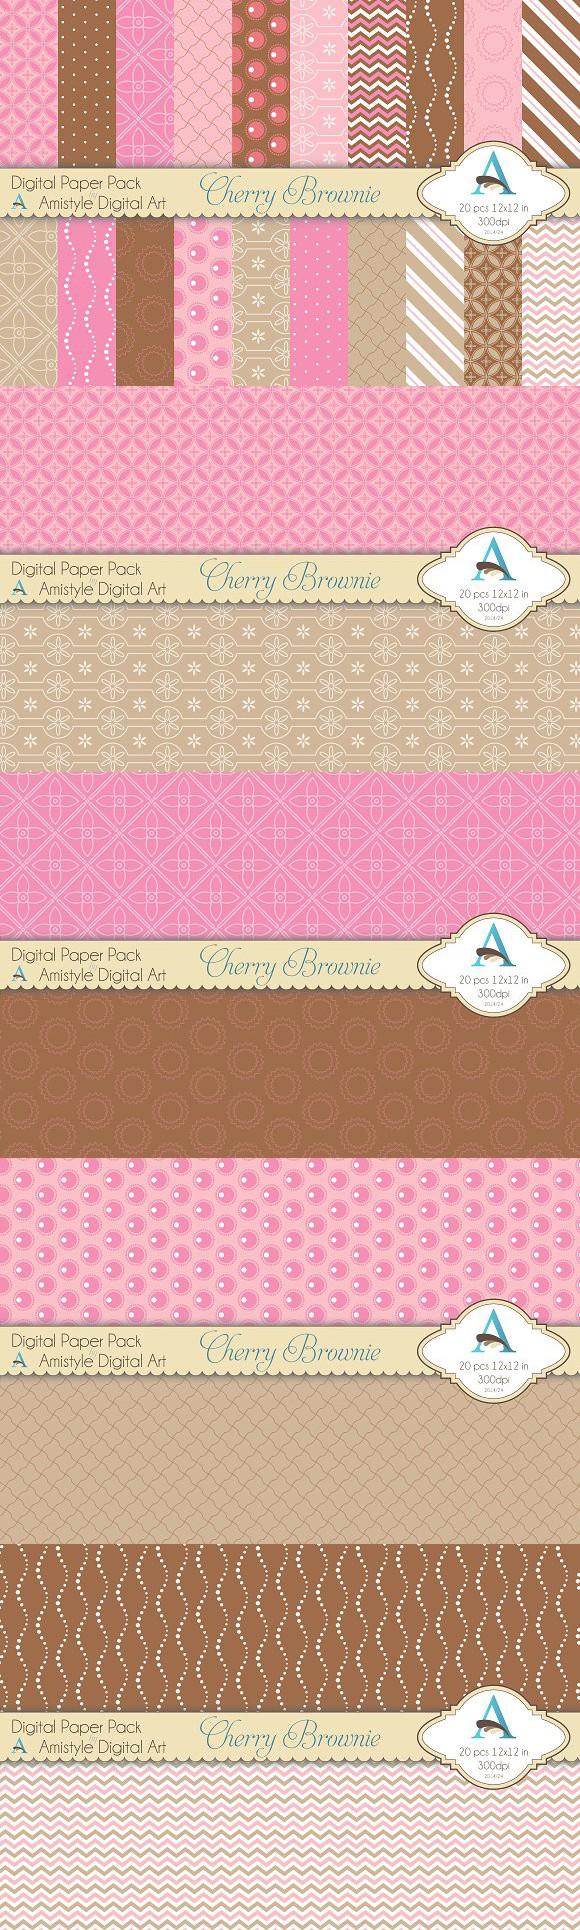 Cherry Brownie Digital Paper Set. Patterns. $5.00